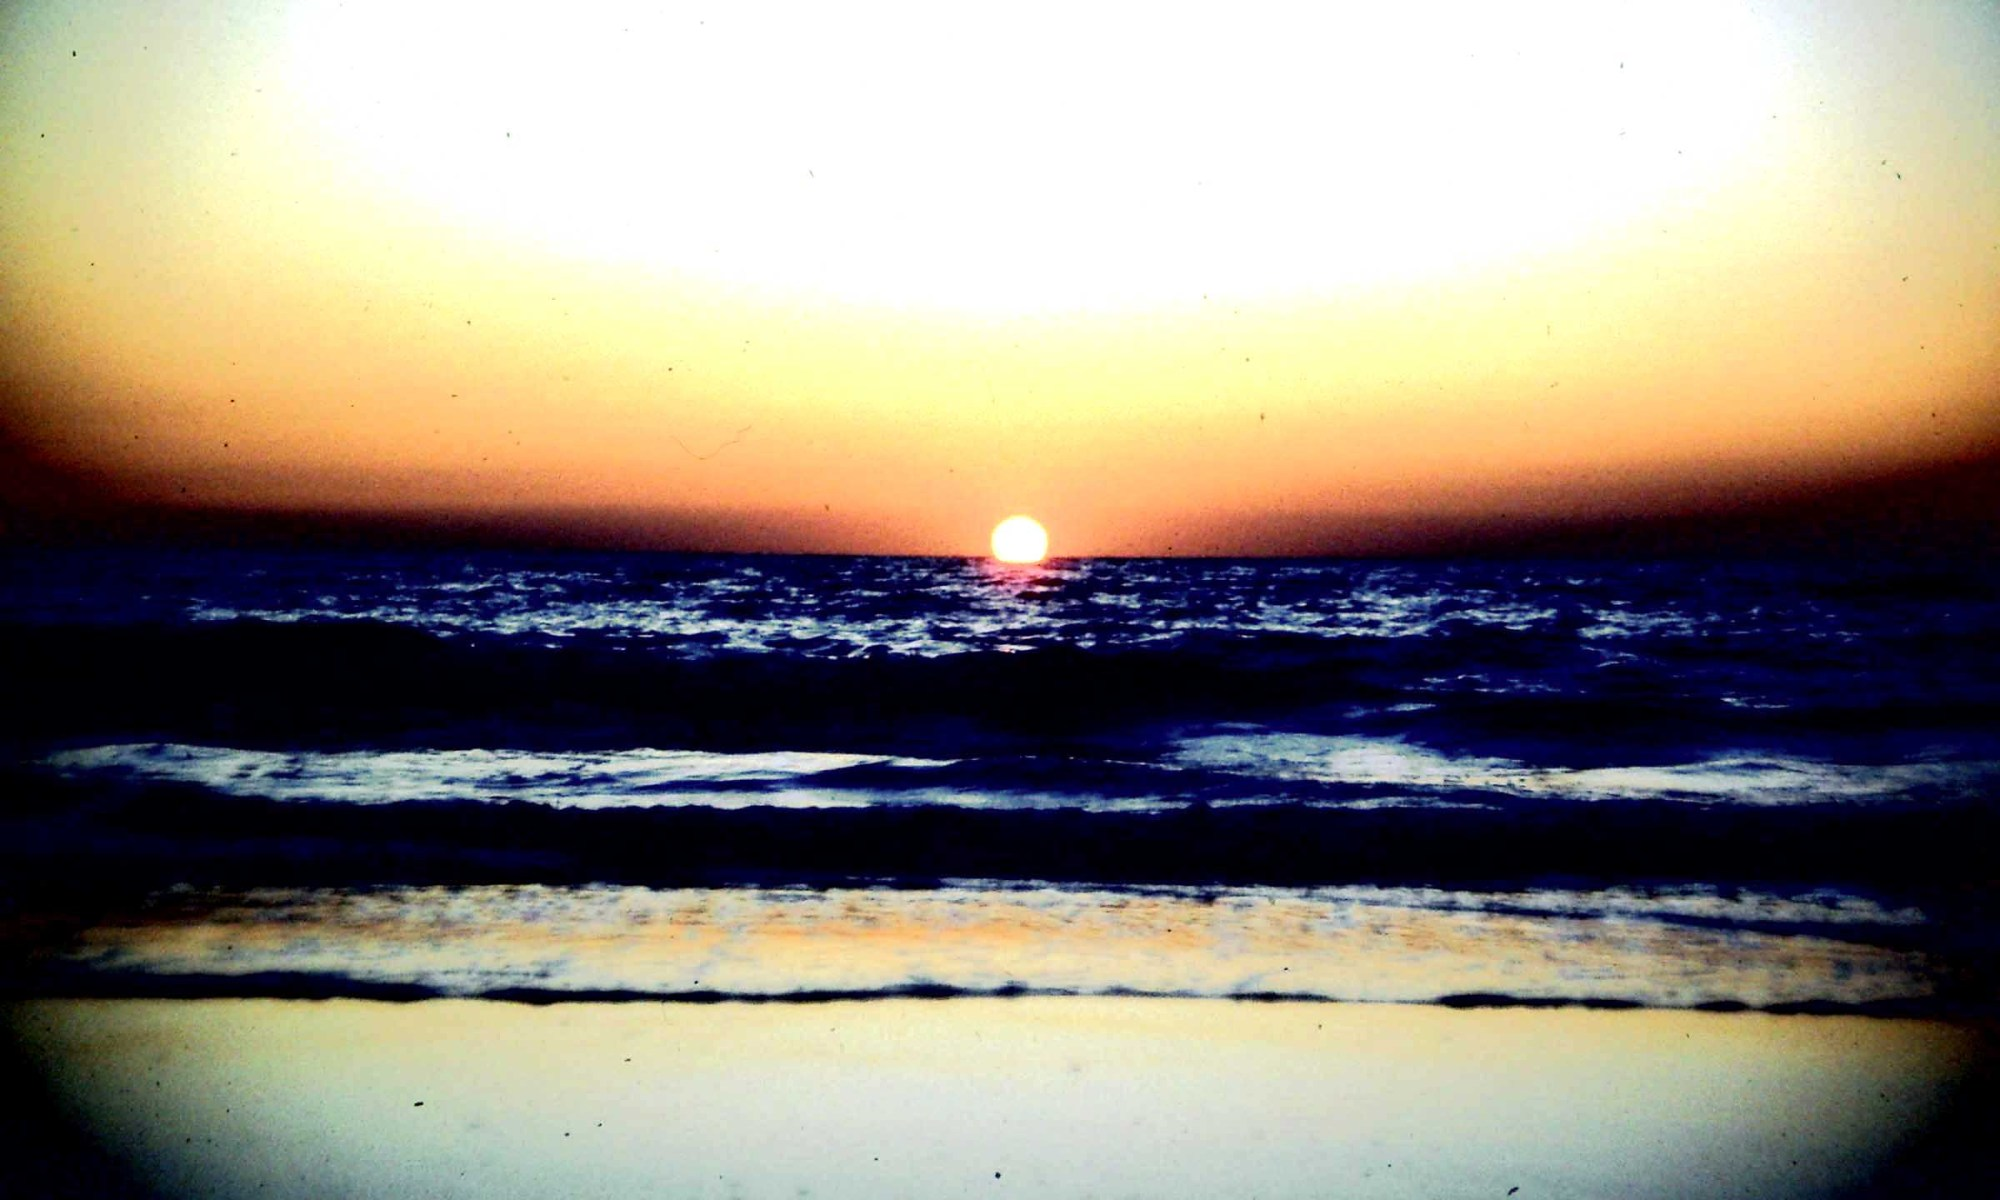 Calangute 1983 Sonnenuntergang (c) Corinne I. Heitz